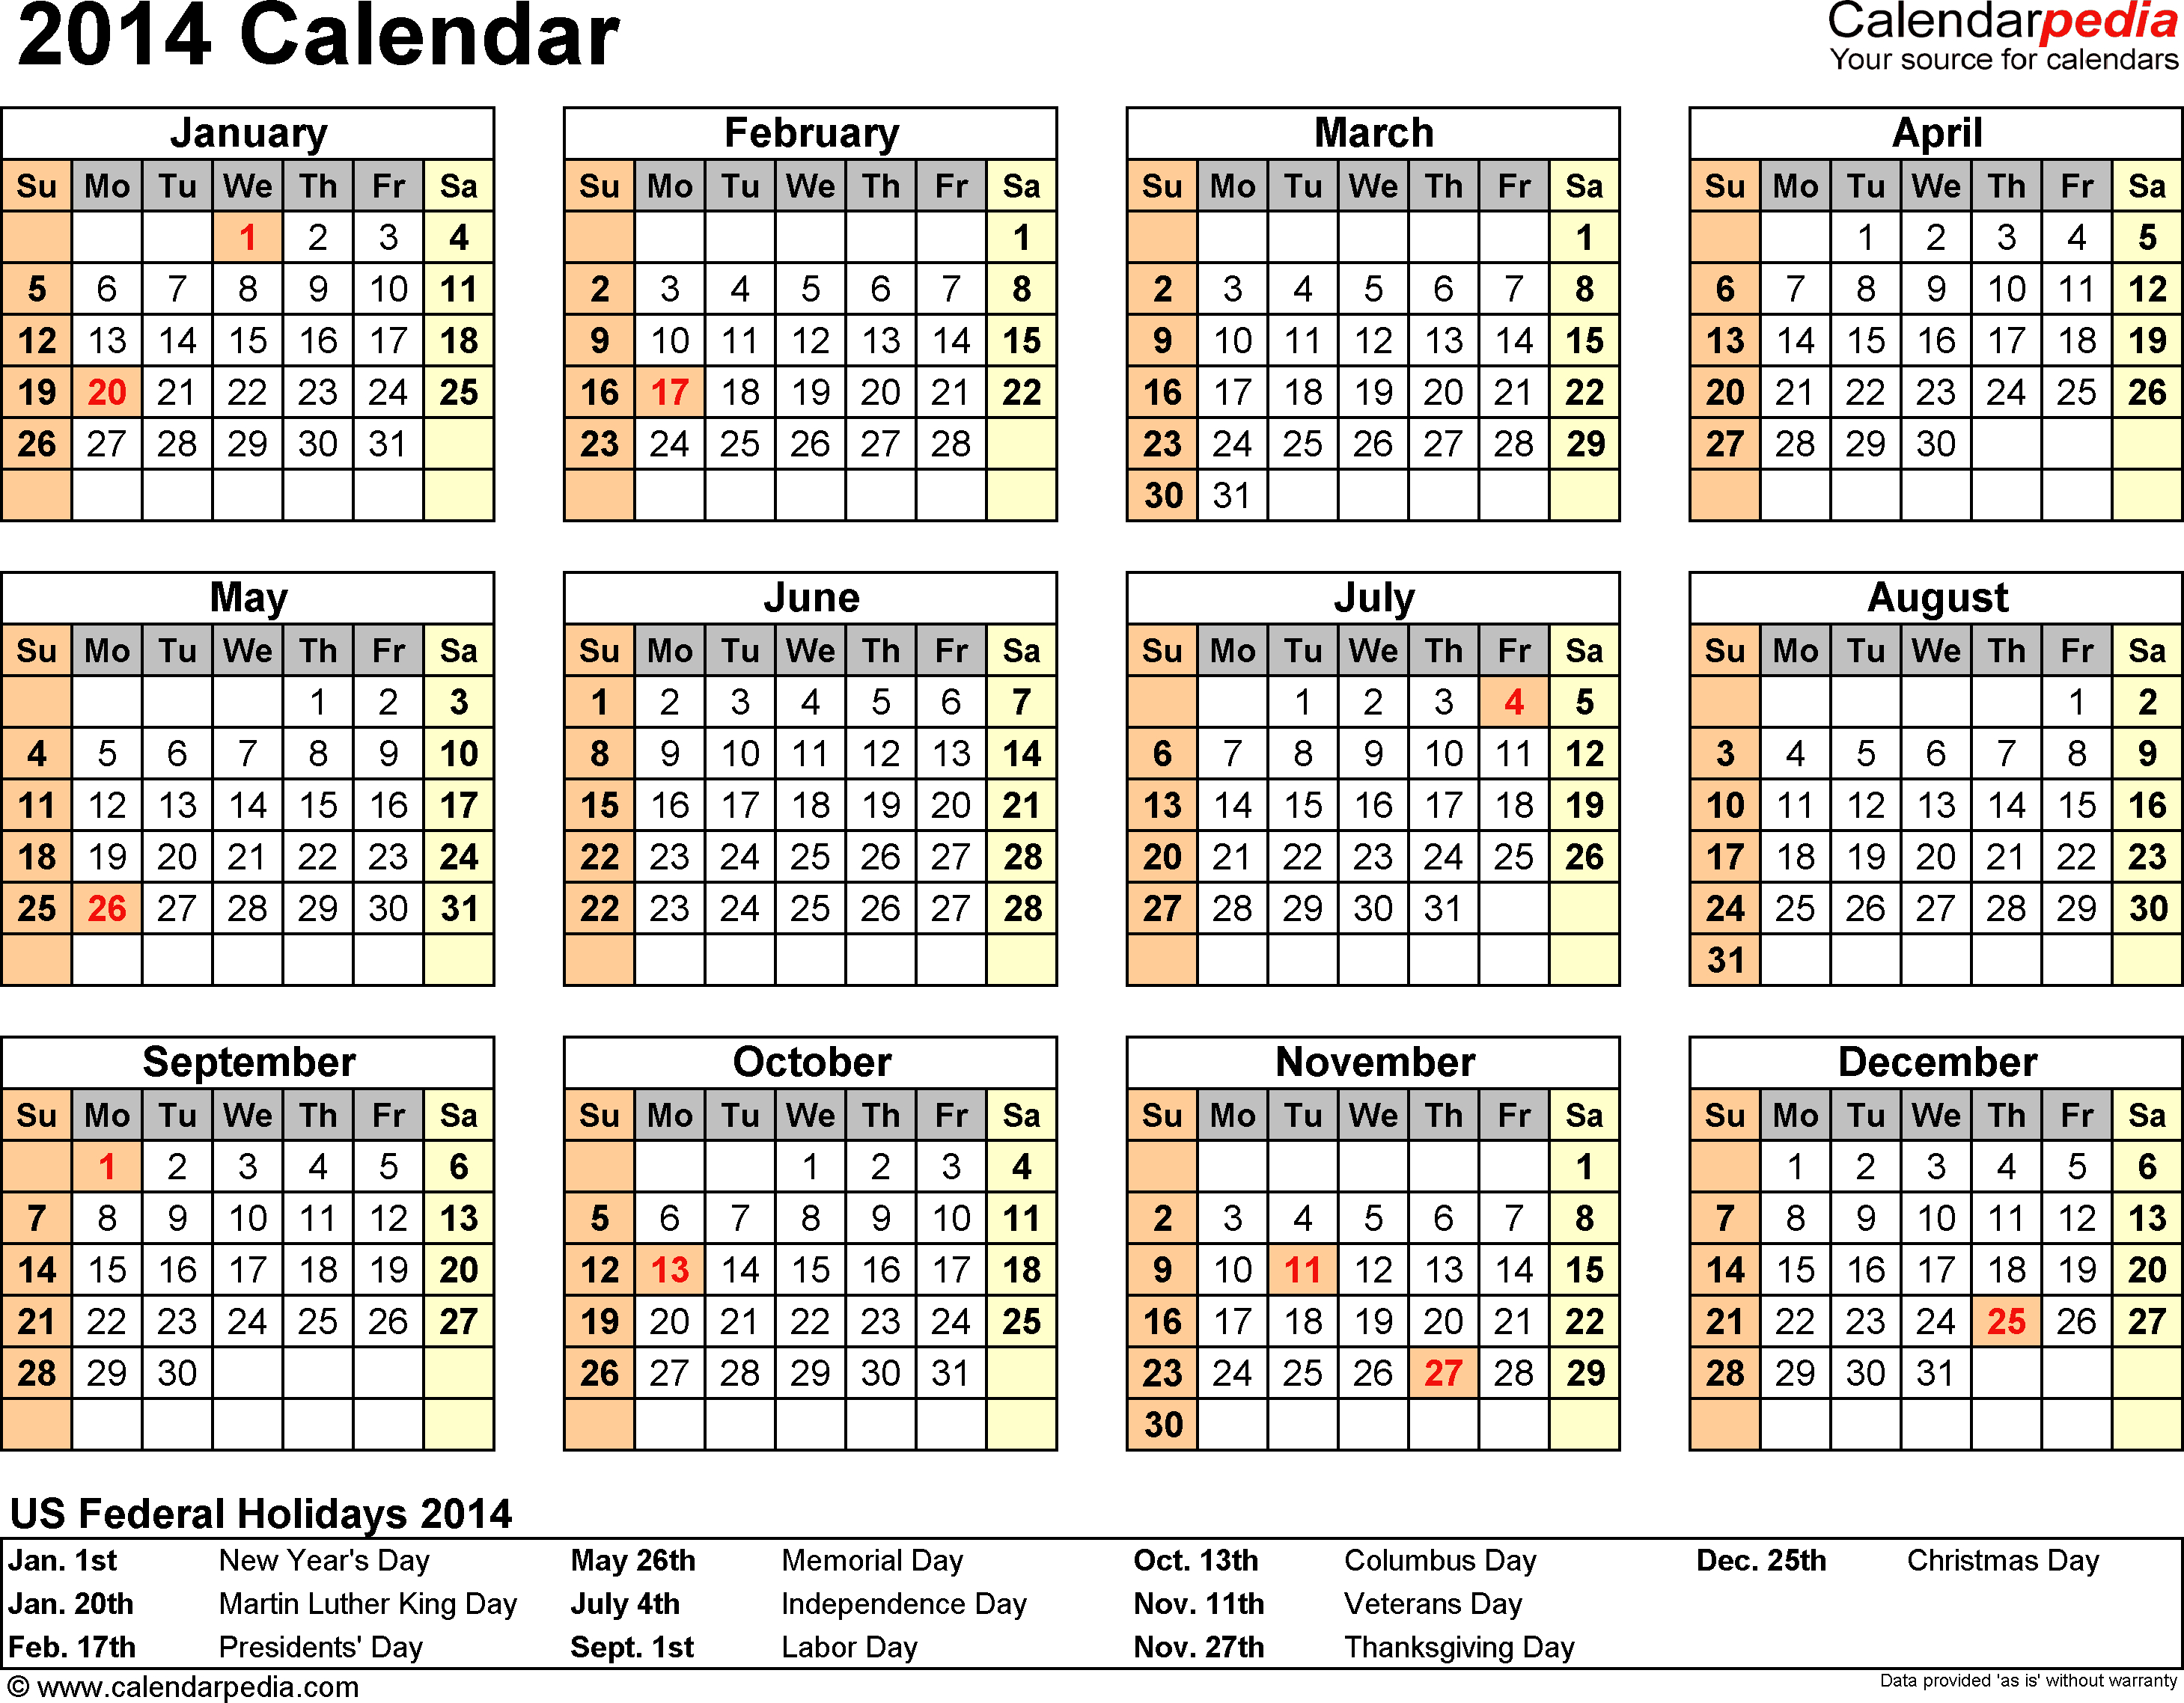 2014 Calendar  13 Free Printable Word Calendar Templates inside 2020 Calendar Qatar Printable